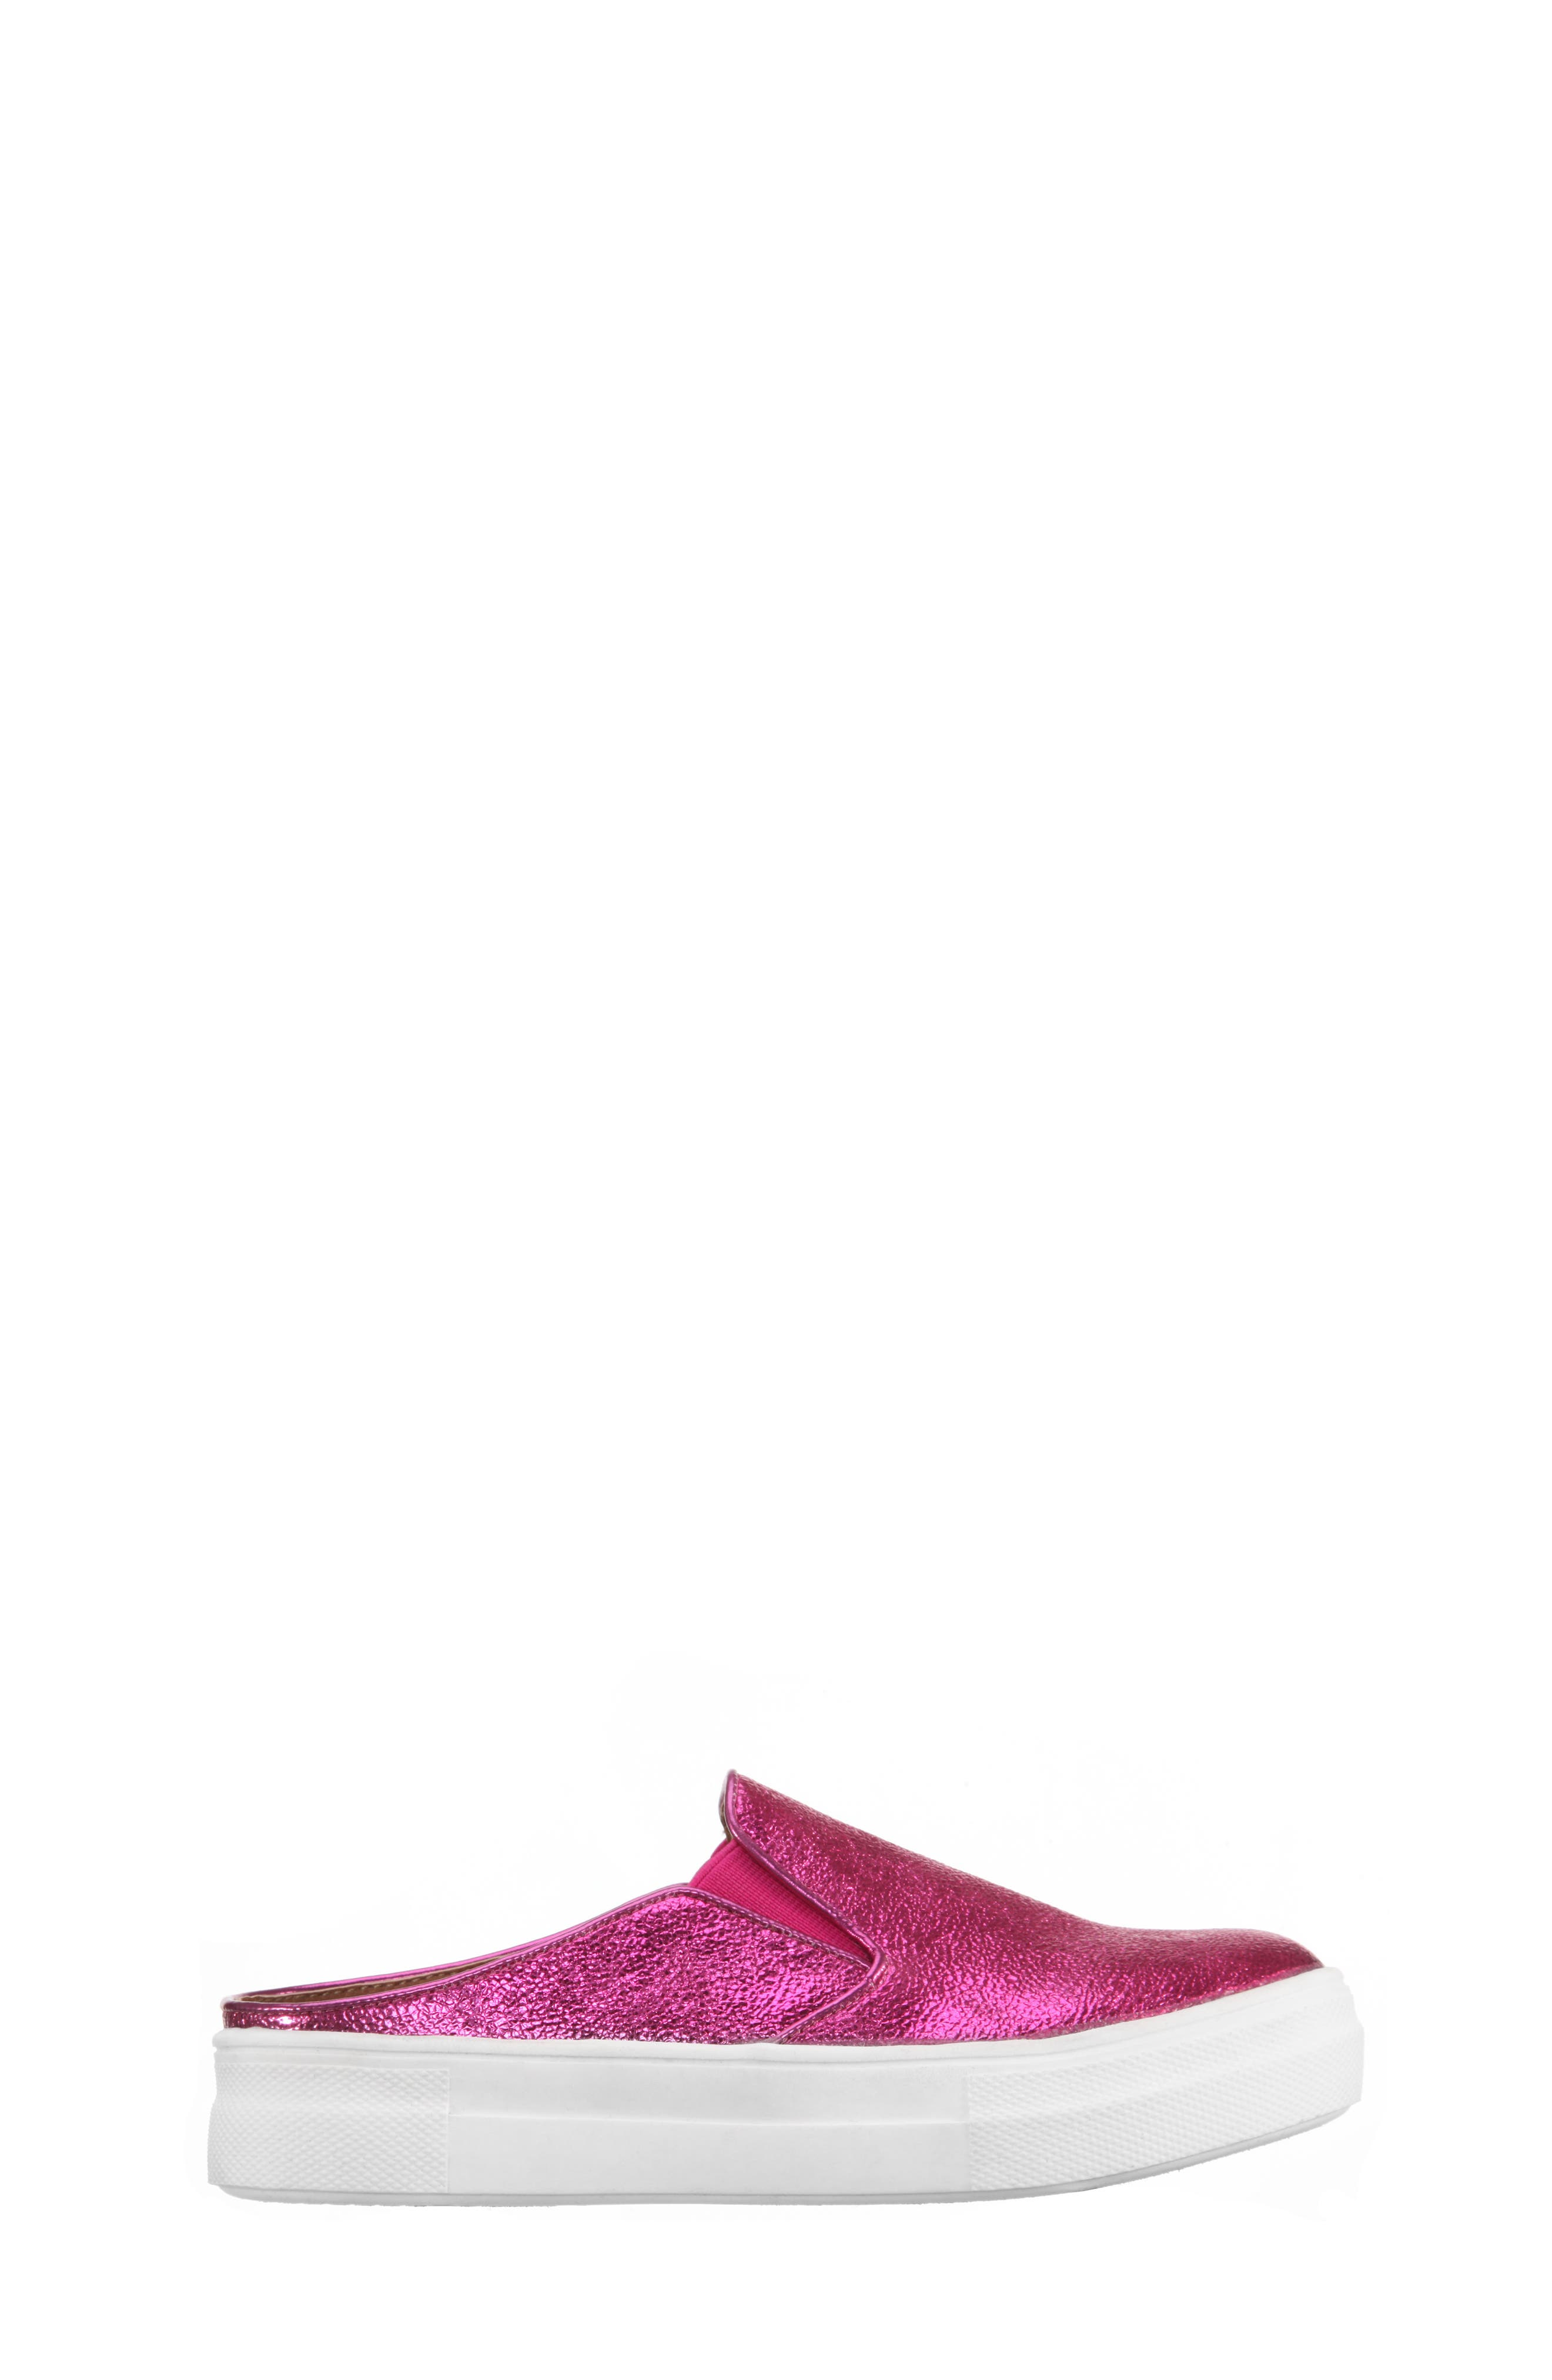 Gail Metallic Slip-On Sneaker Mule,                             Alternate thumbnail 2, color,                             Pink Metallic Crackle